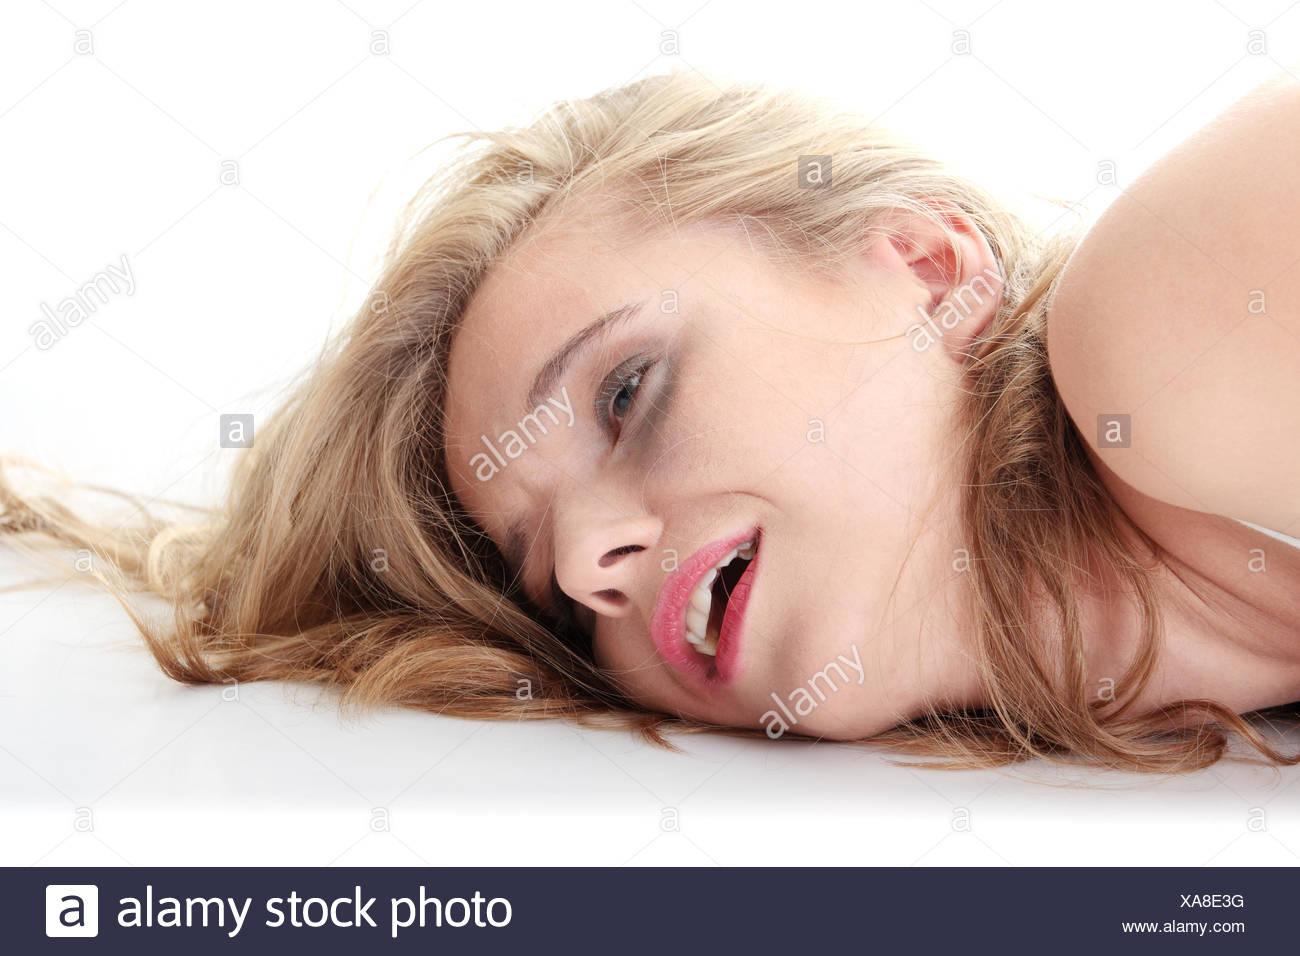 Schlechte Anal-Sex-Geschichten